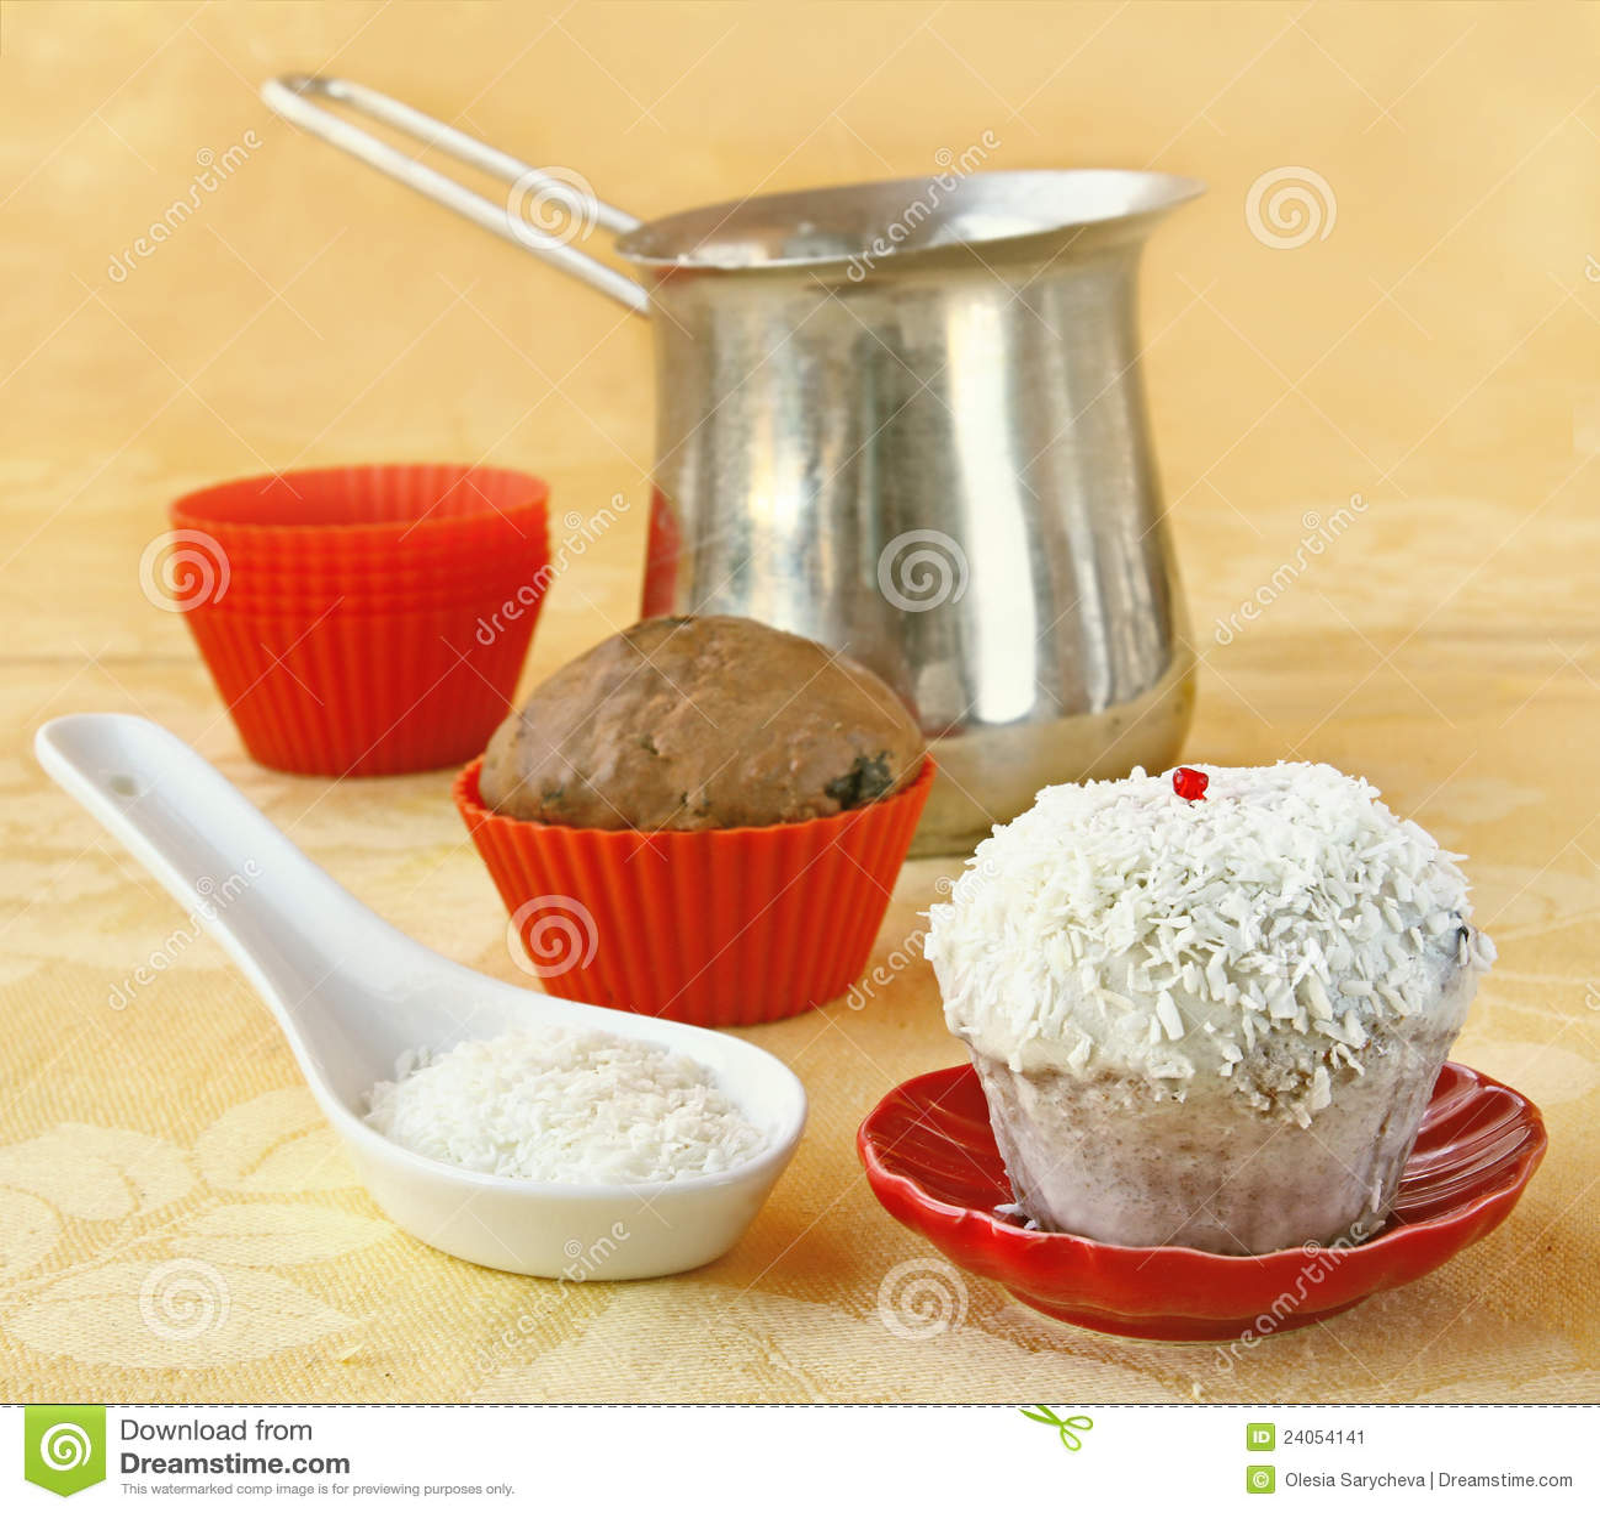 Decoration cupcake cream and coconut shaving stock image image 24054141 - Creme decoration cupcake ...